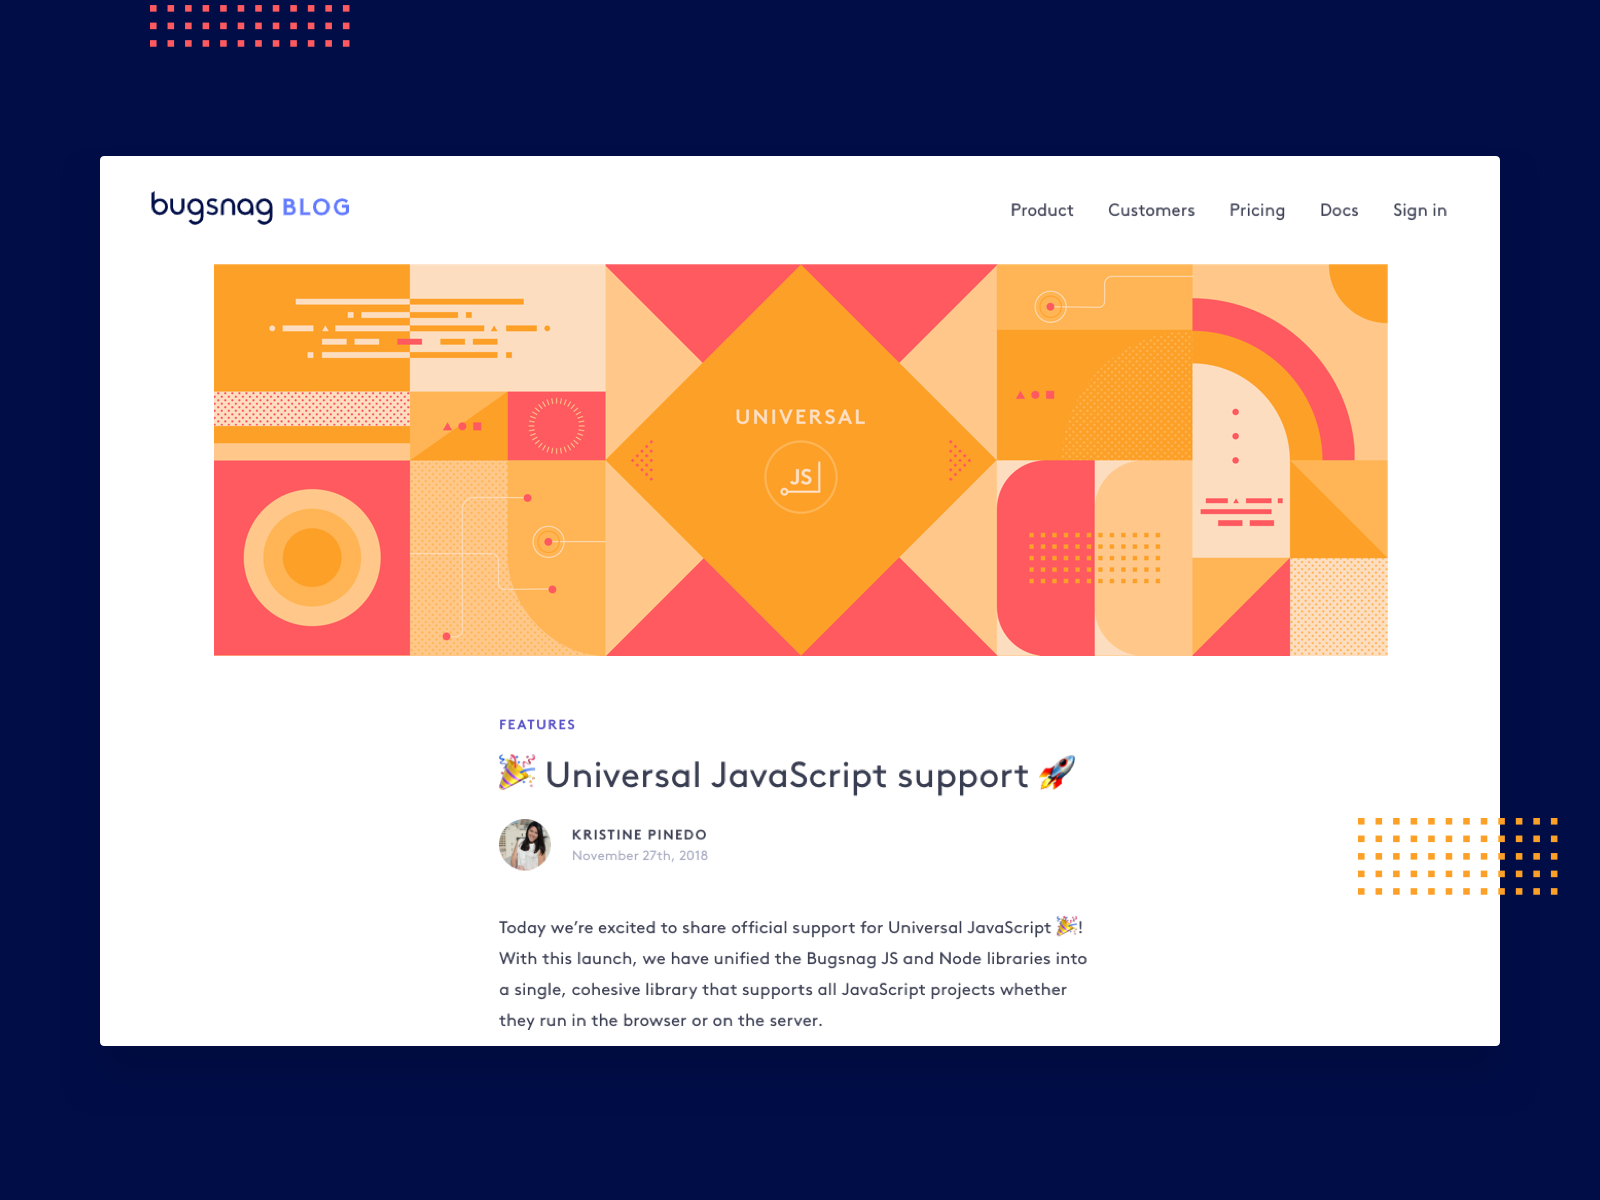 2018 11 27 bugsnag blog universal js 2x